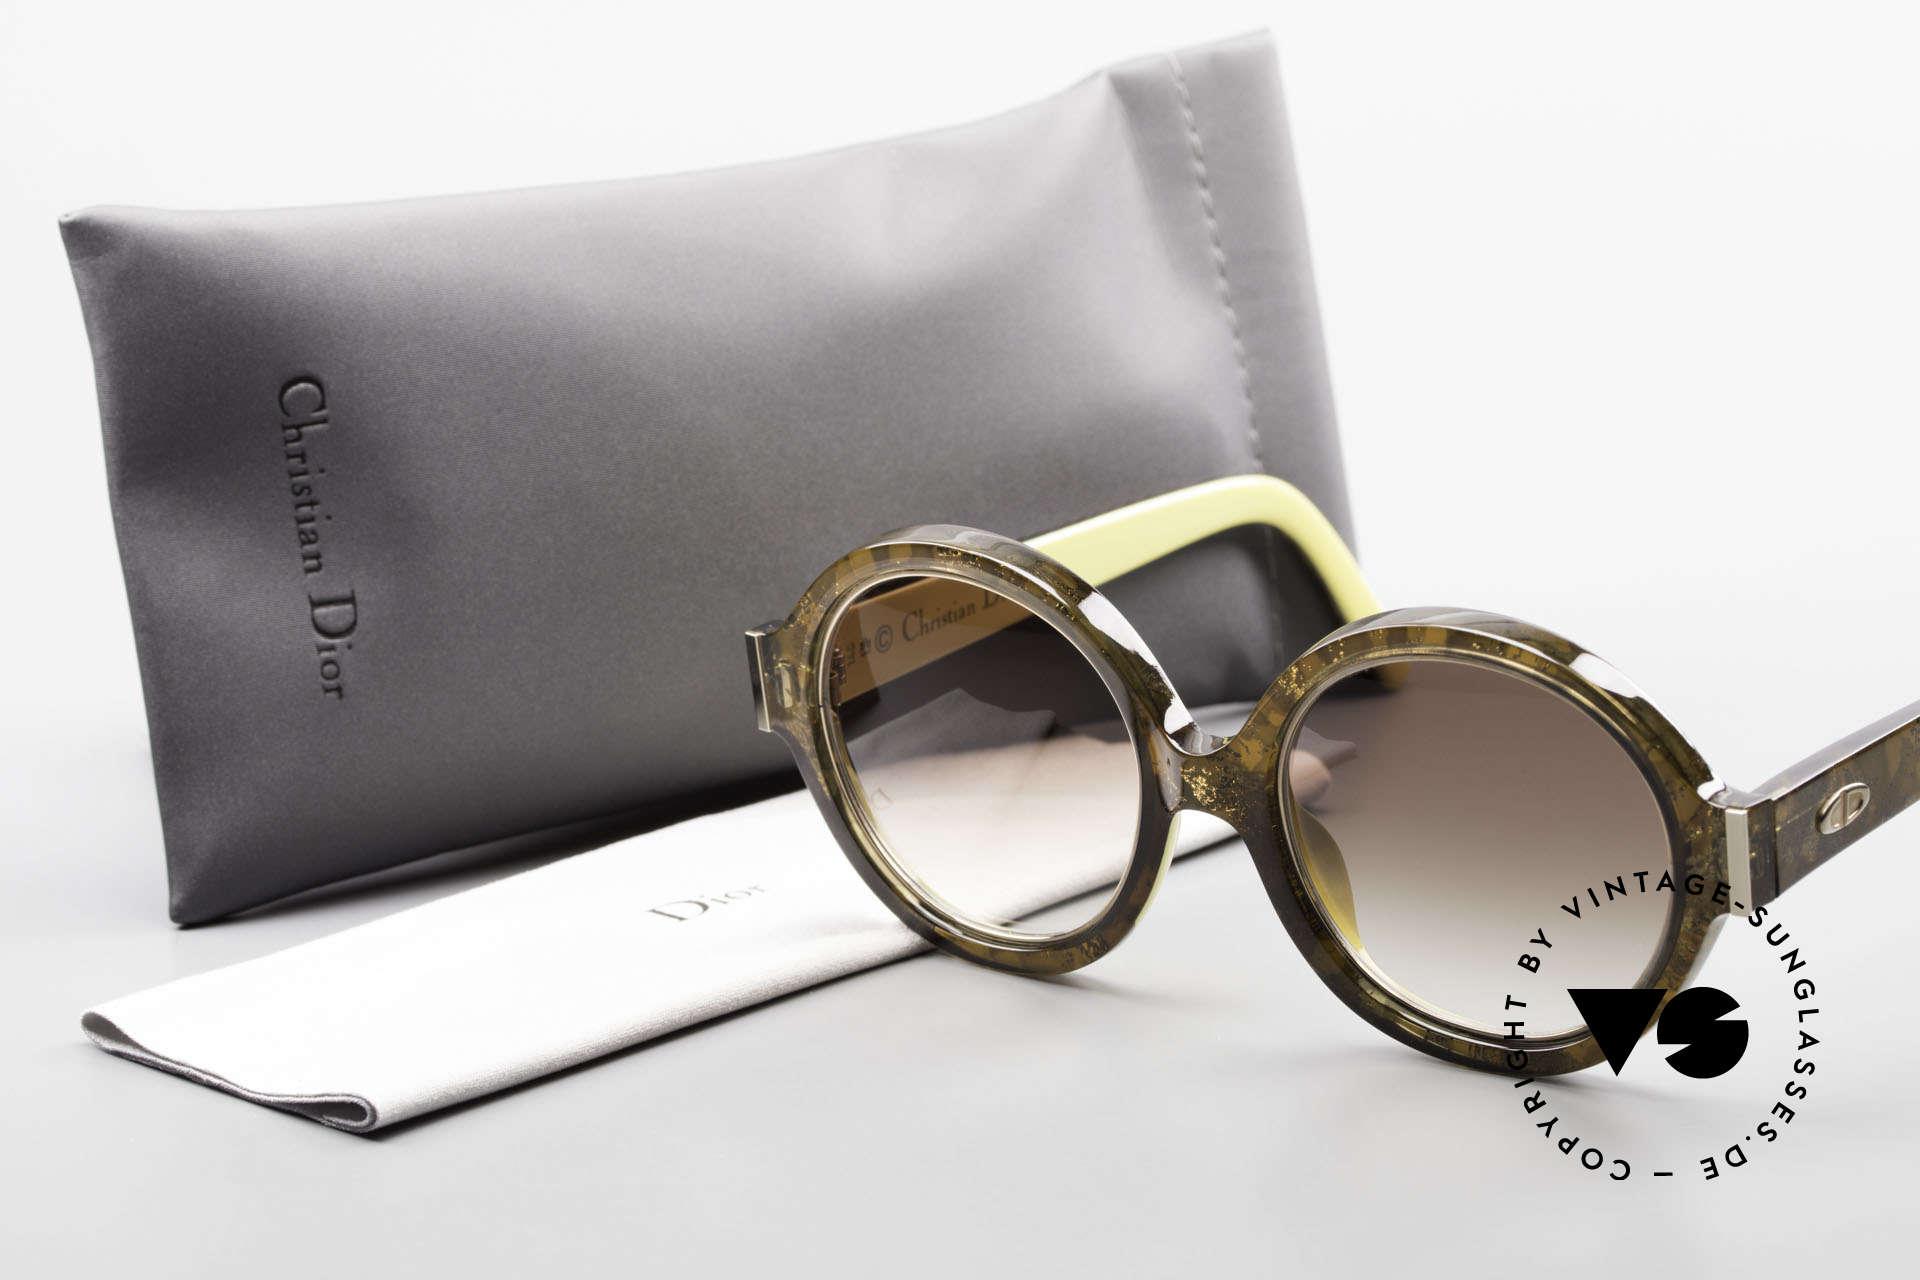 Christian Dior 2446 Round 80's Sunglasses Ladies, Size: medium, Made for Women